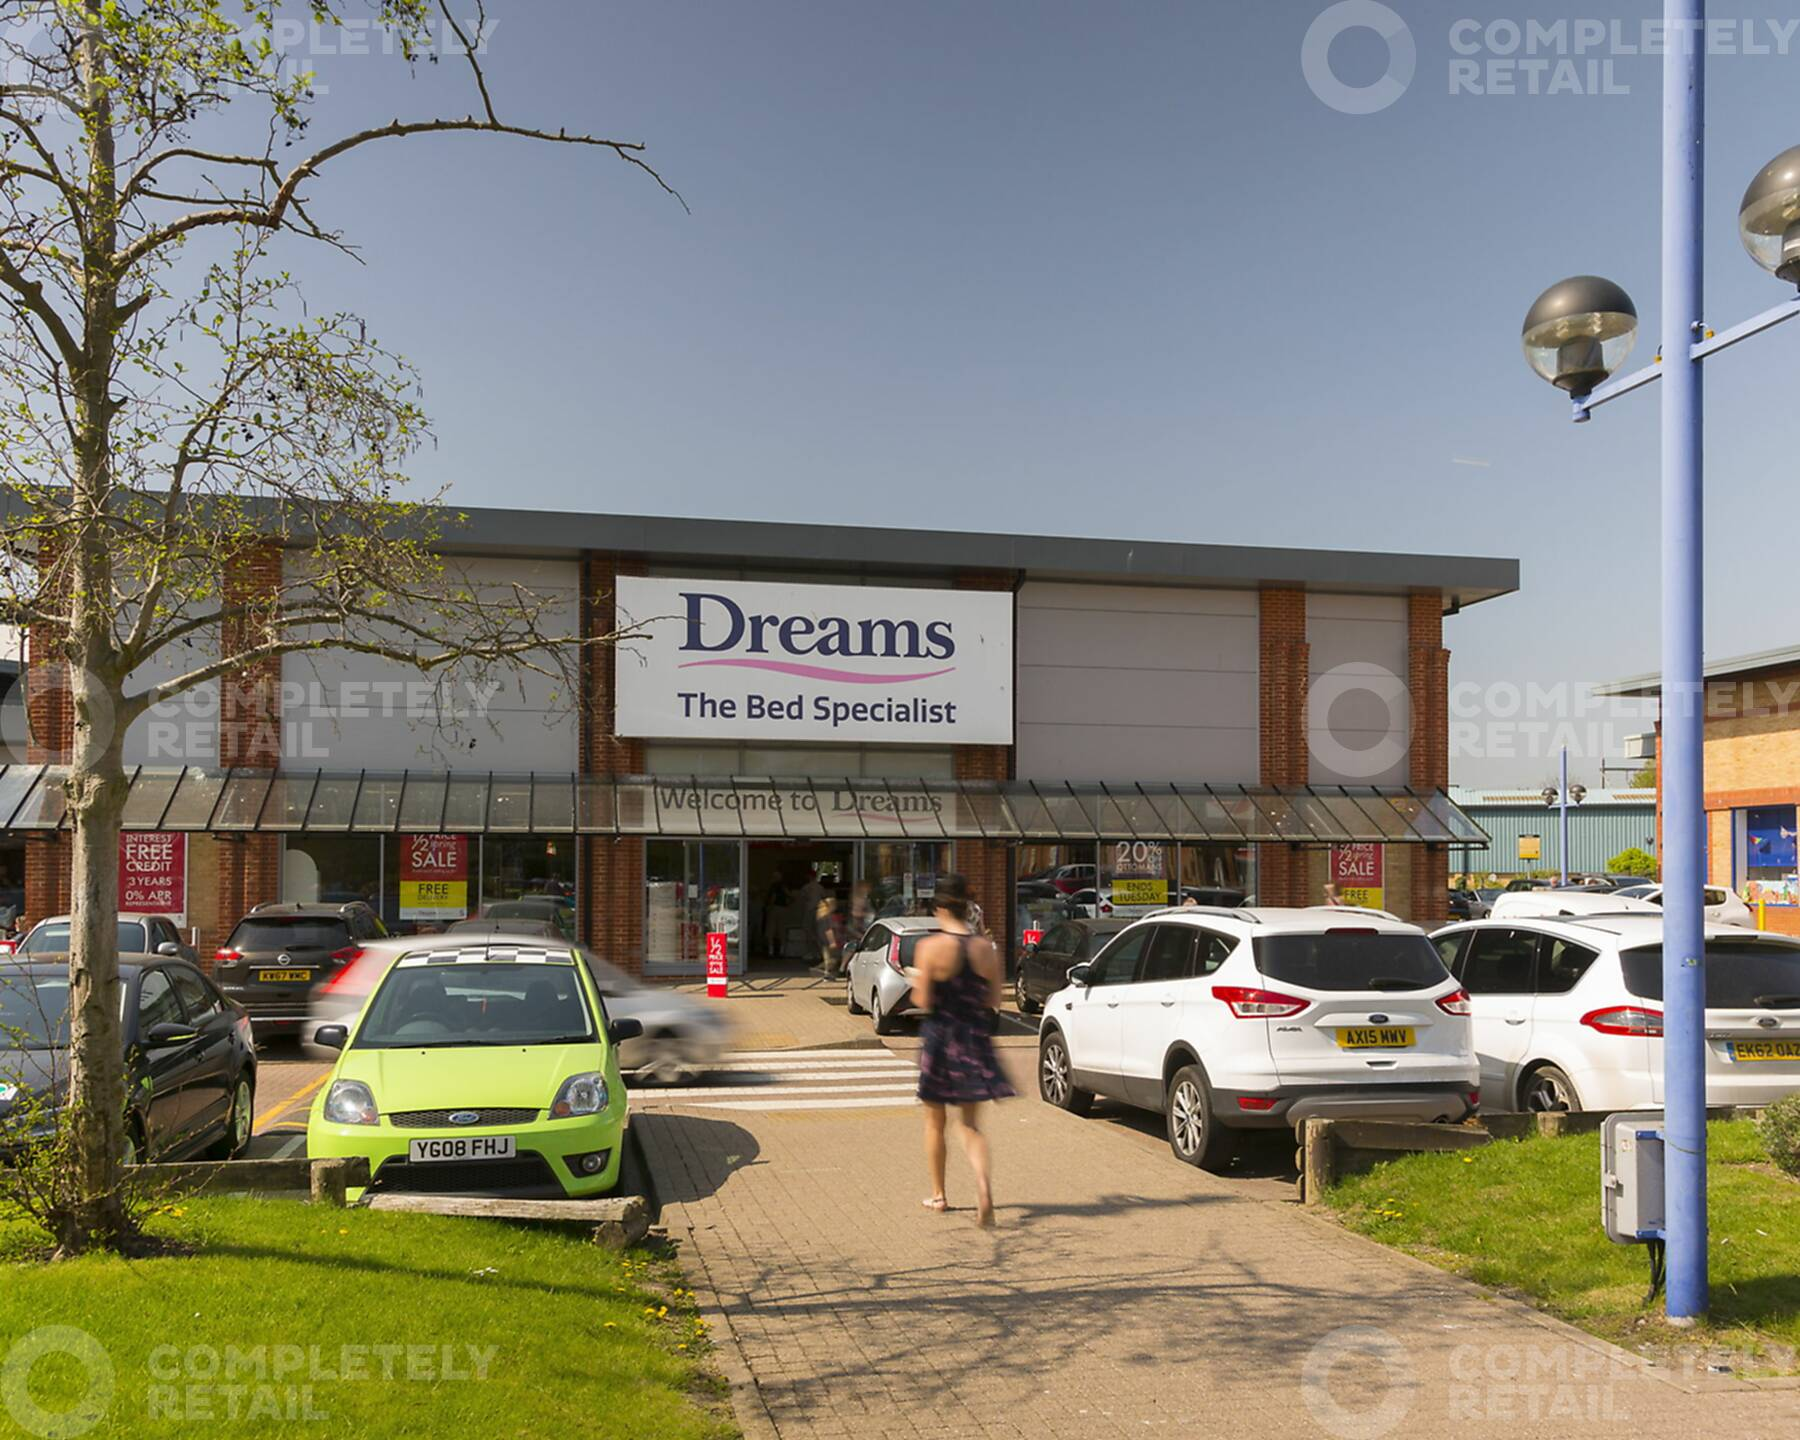 Riverside Retail Park